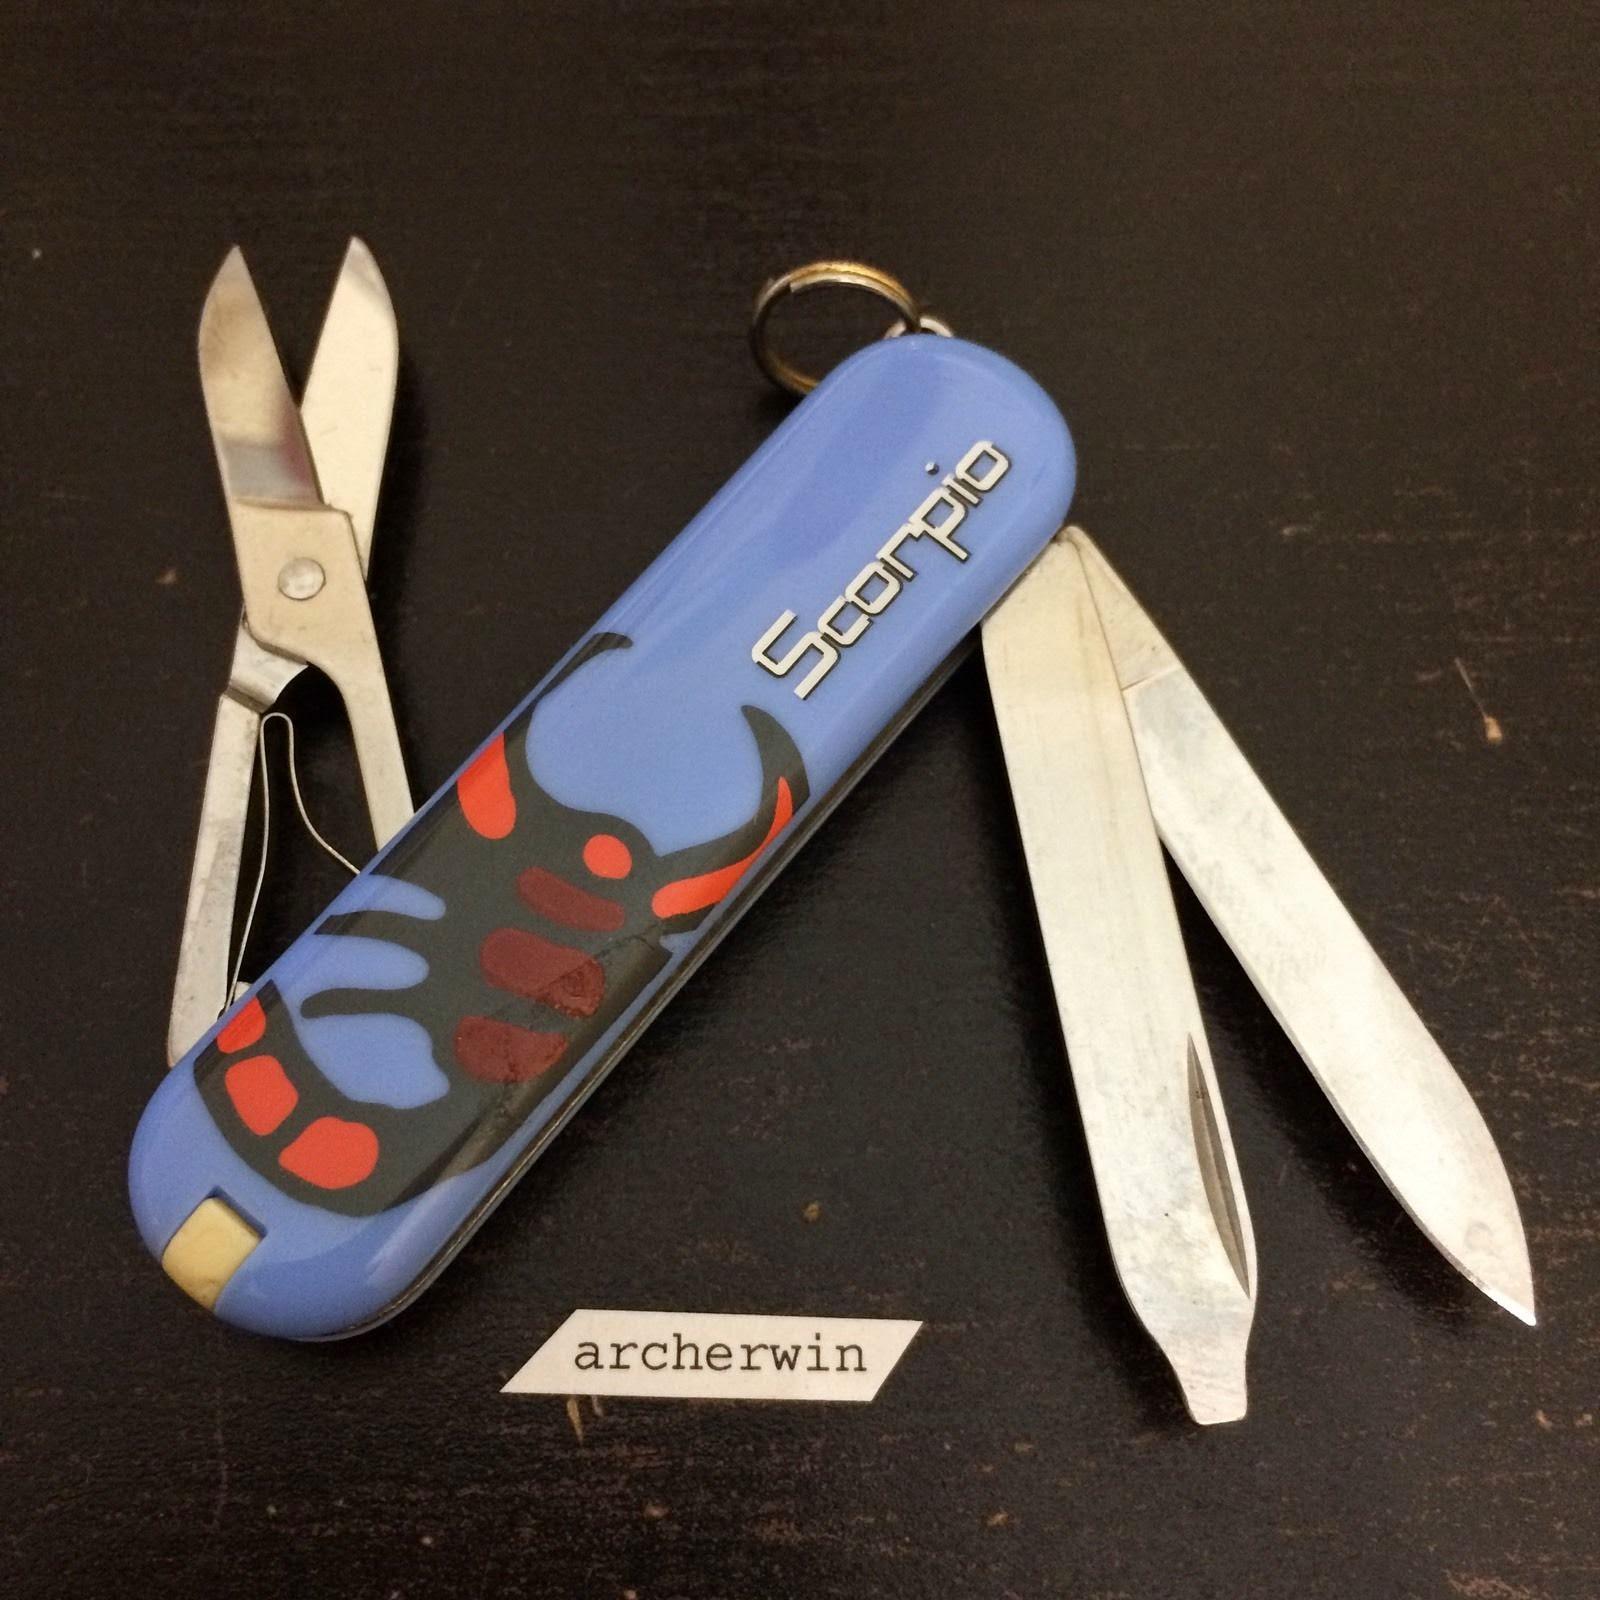 Archerwin S Swiss Army Knives Prints Victorinox Classic